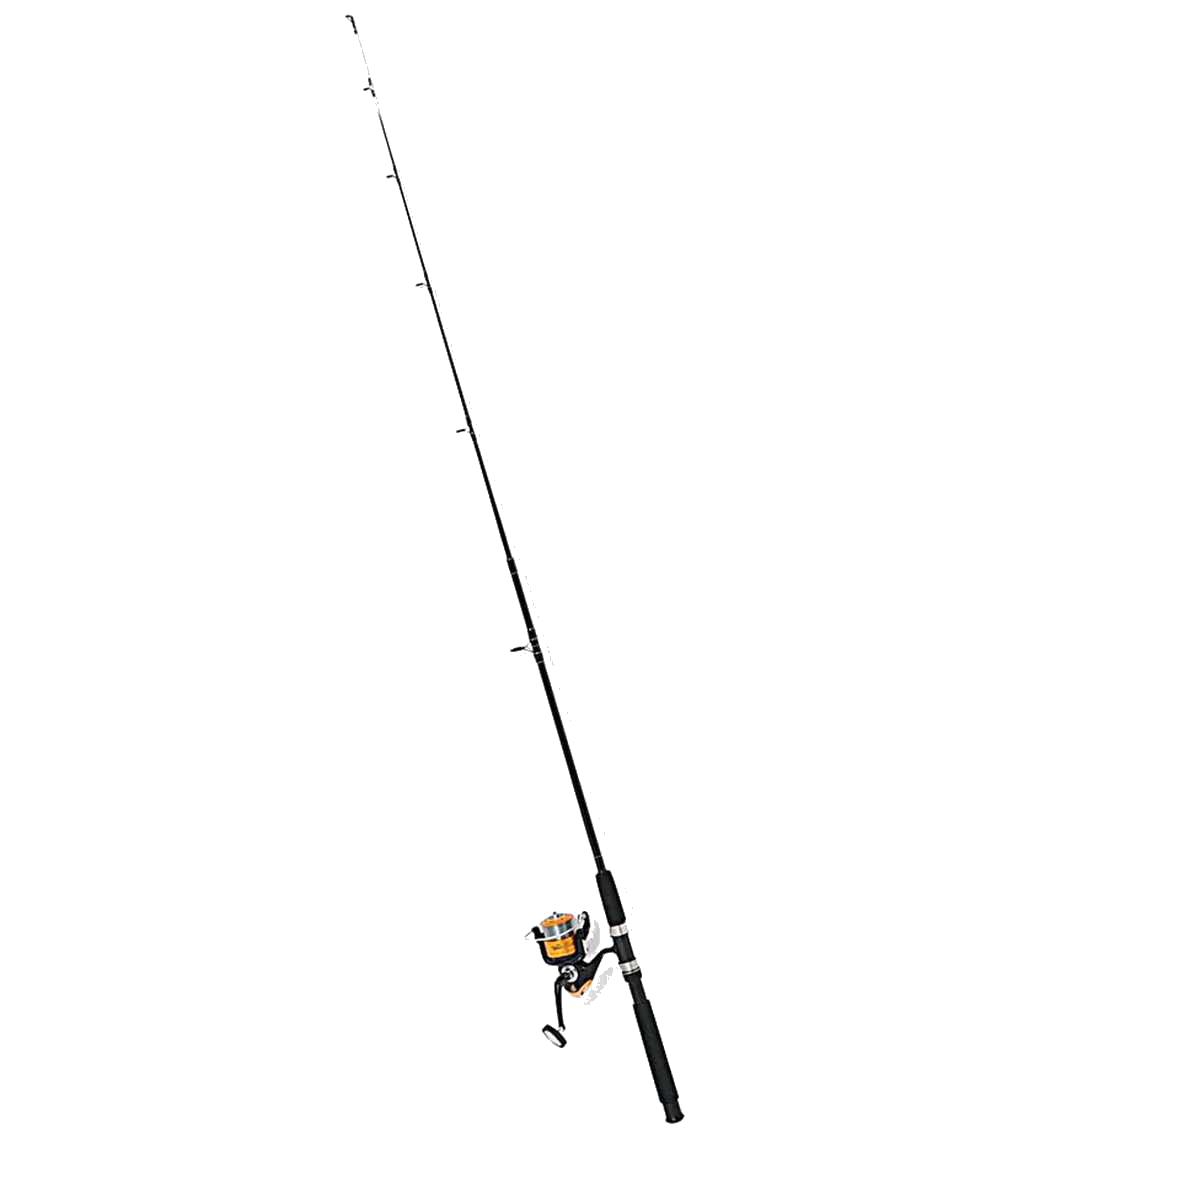 Fishing PNG Transparent Image